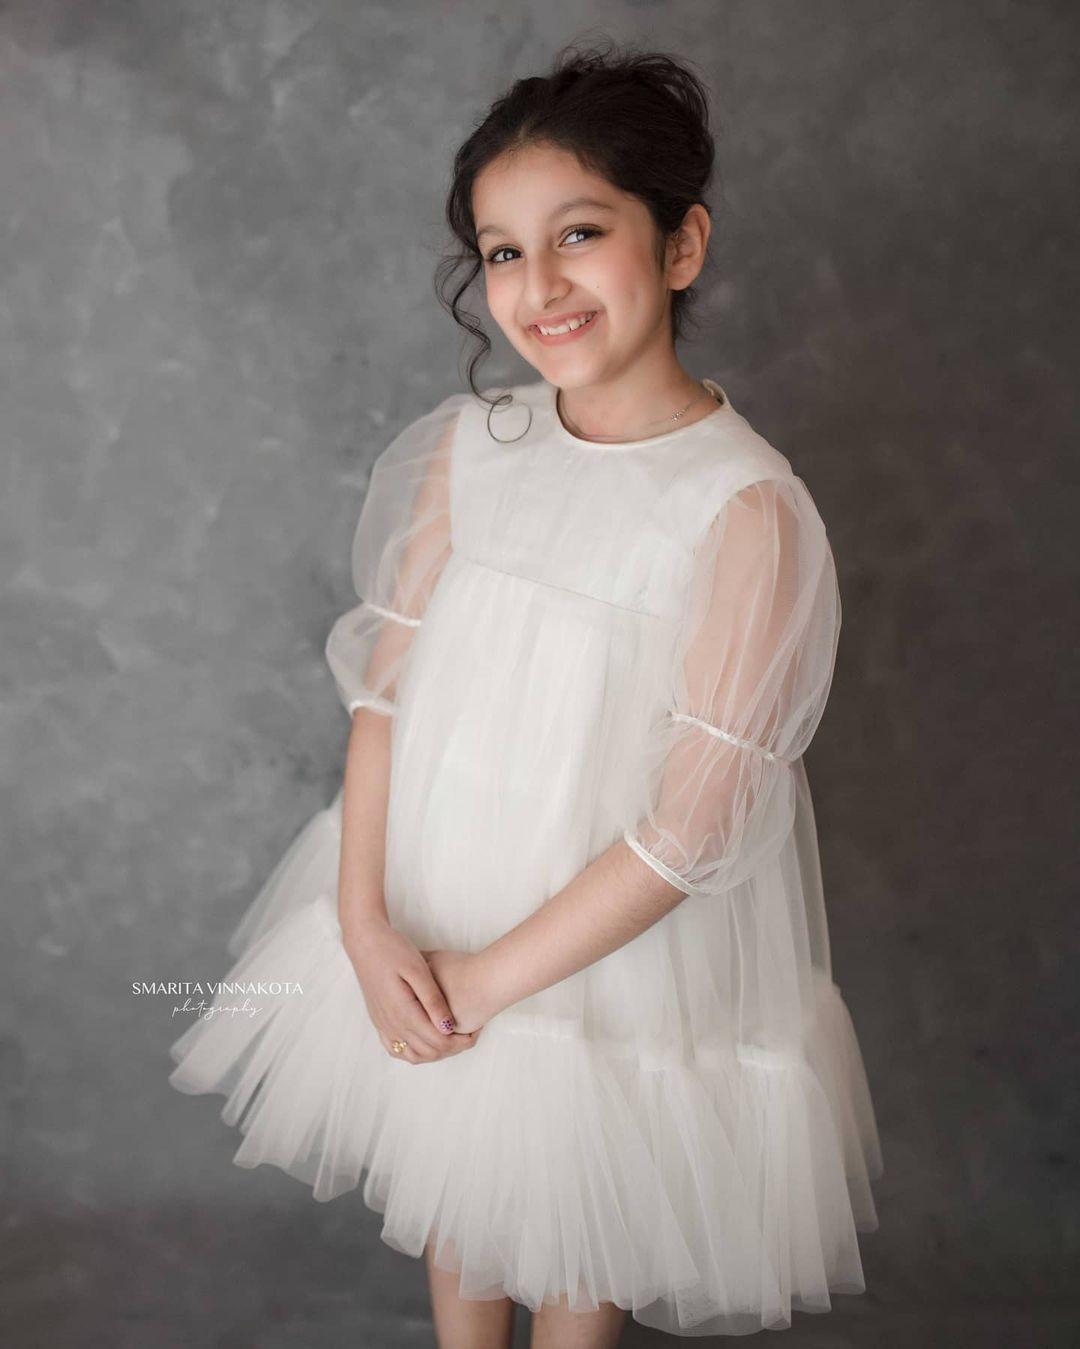 Sitara Ghattamaneni in a white dress by Janya's closet